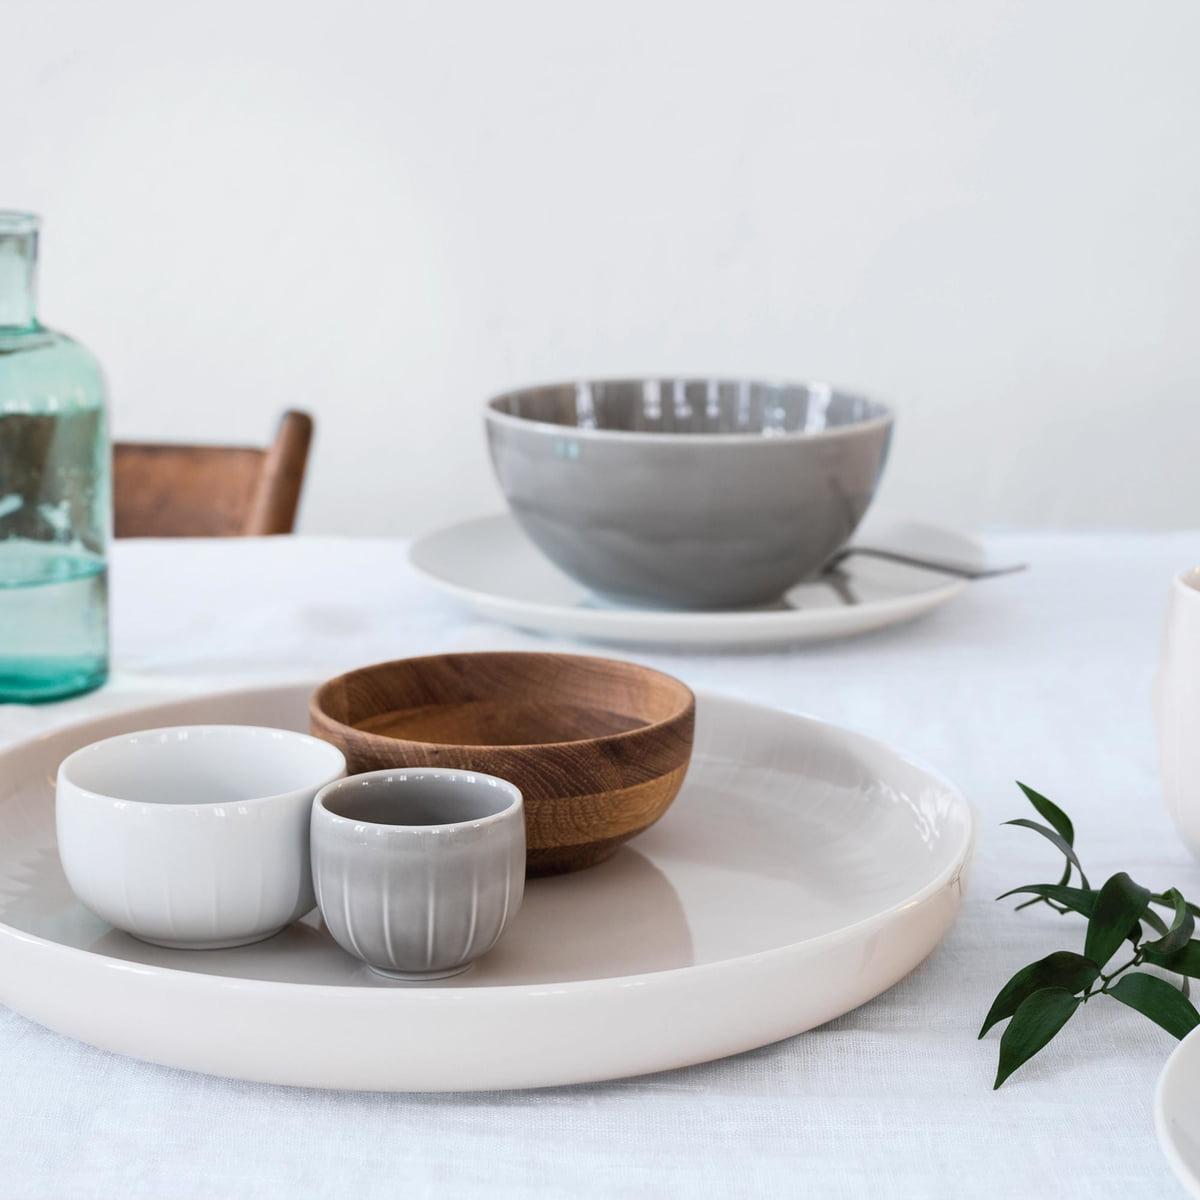 Küche Geschirr Modernen Haushalt ...